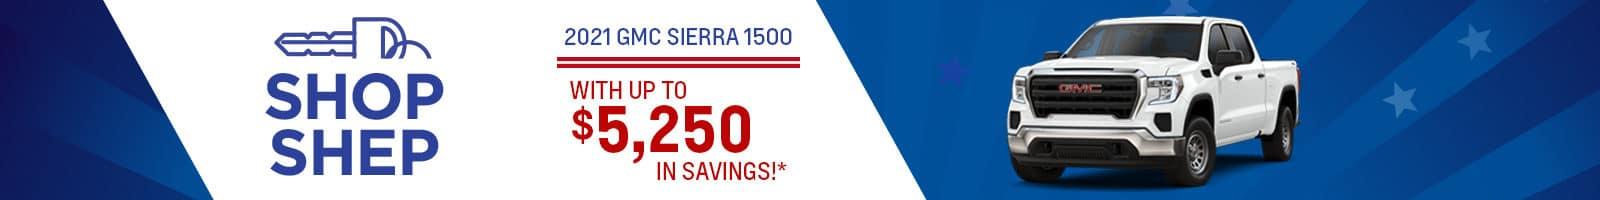 Save big on a new 2021 GMC Sierra 1500